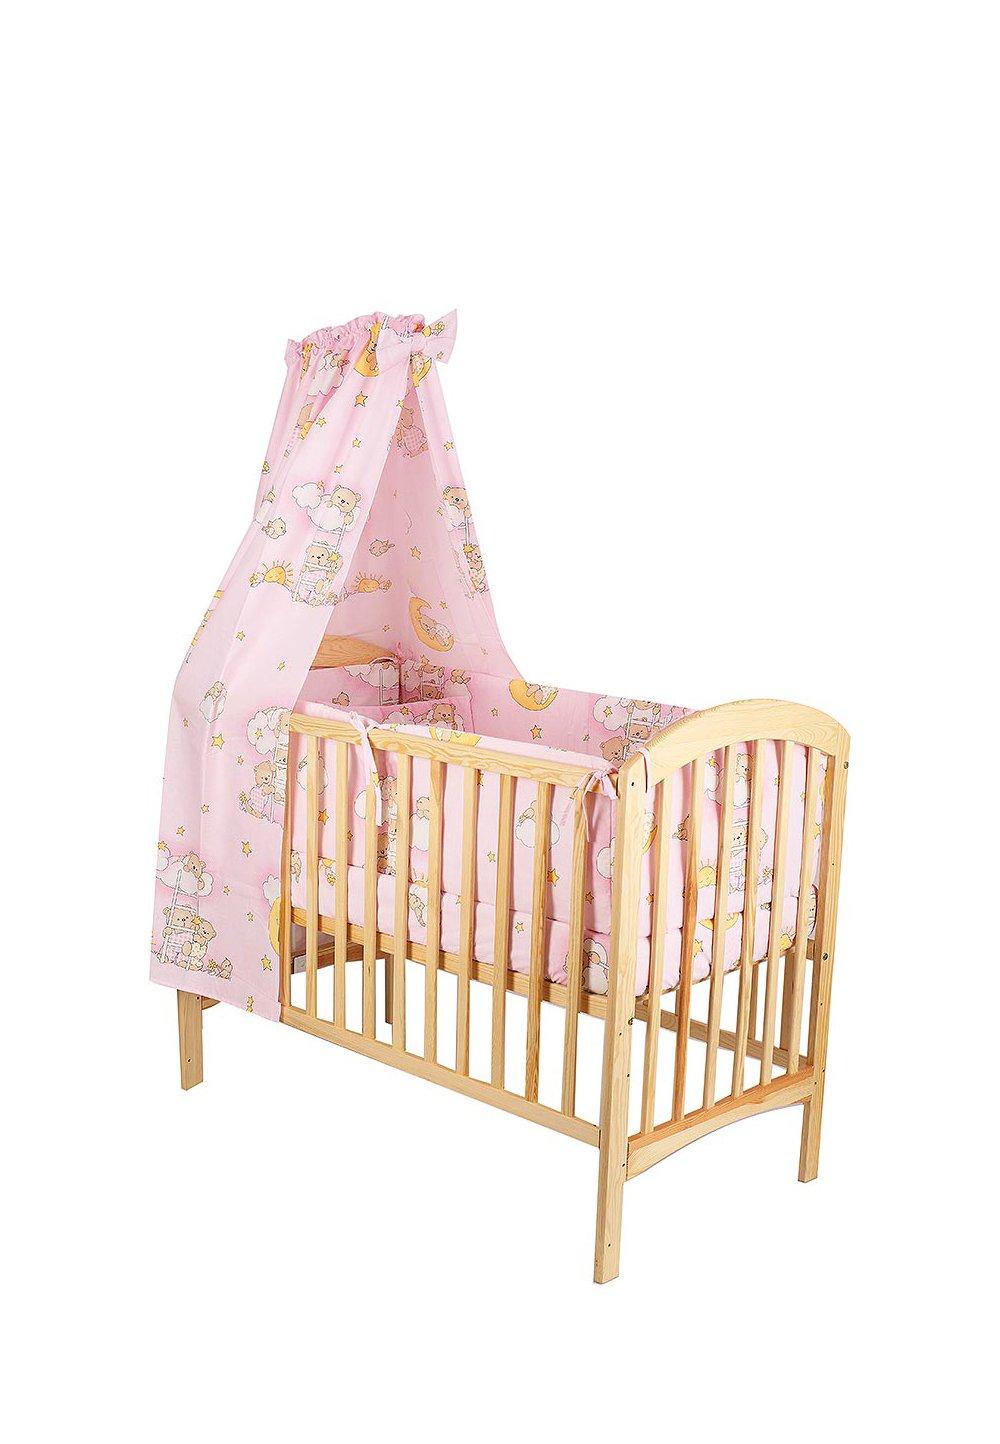 Lenjerie cu baldachin, 6 piese, ursuletul somnoros, roz 120x60 cm imagine